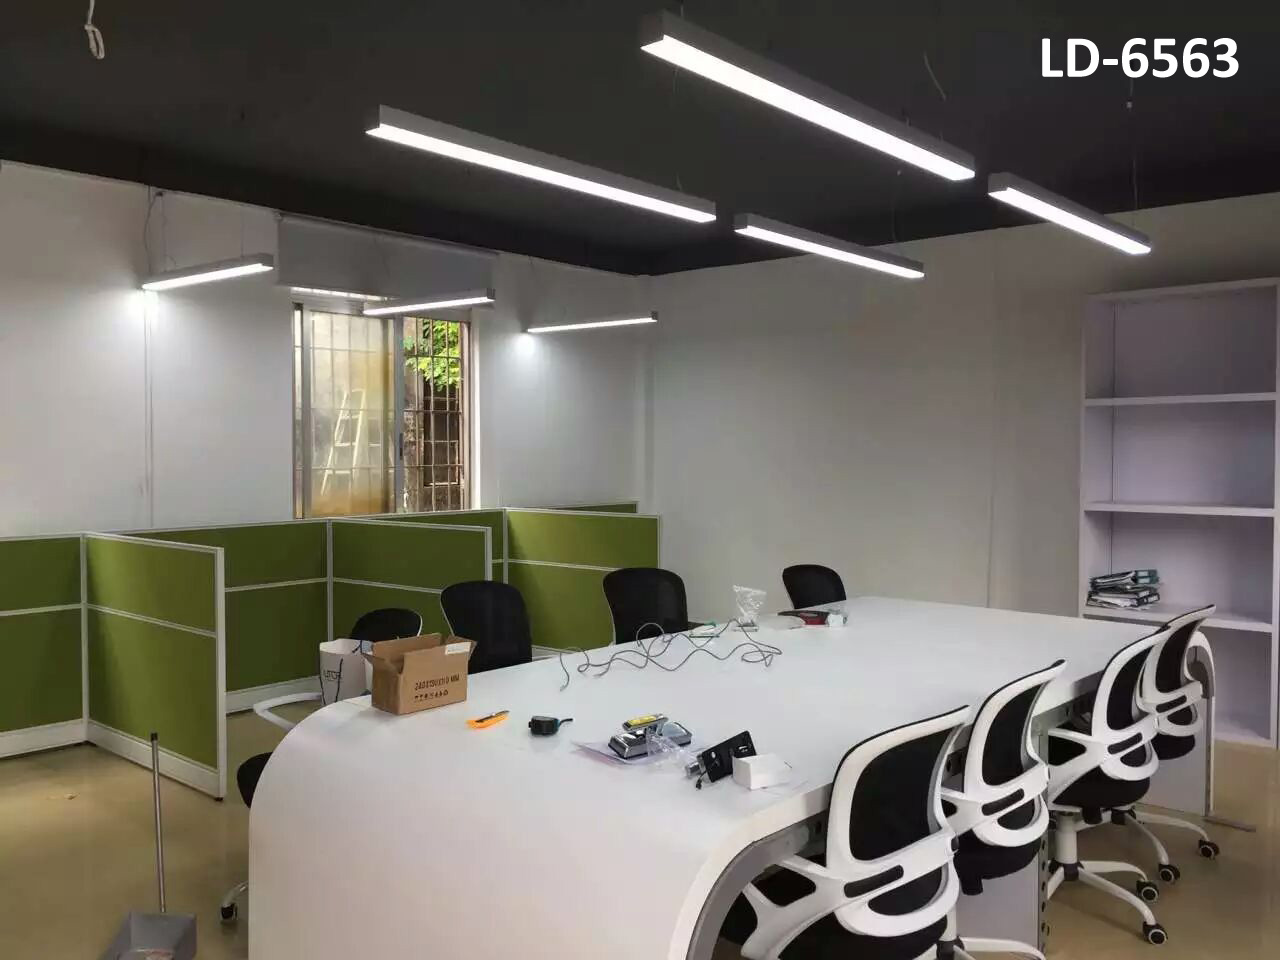 2018 Linear Light Fixture New Model Bengi